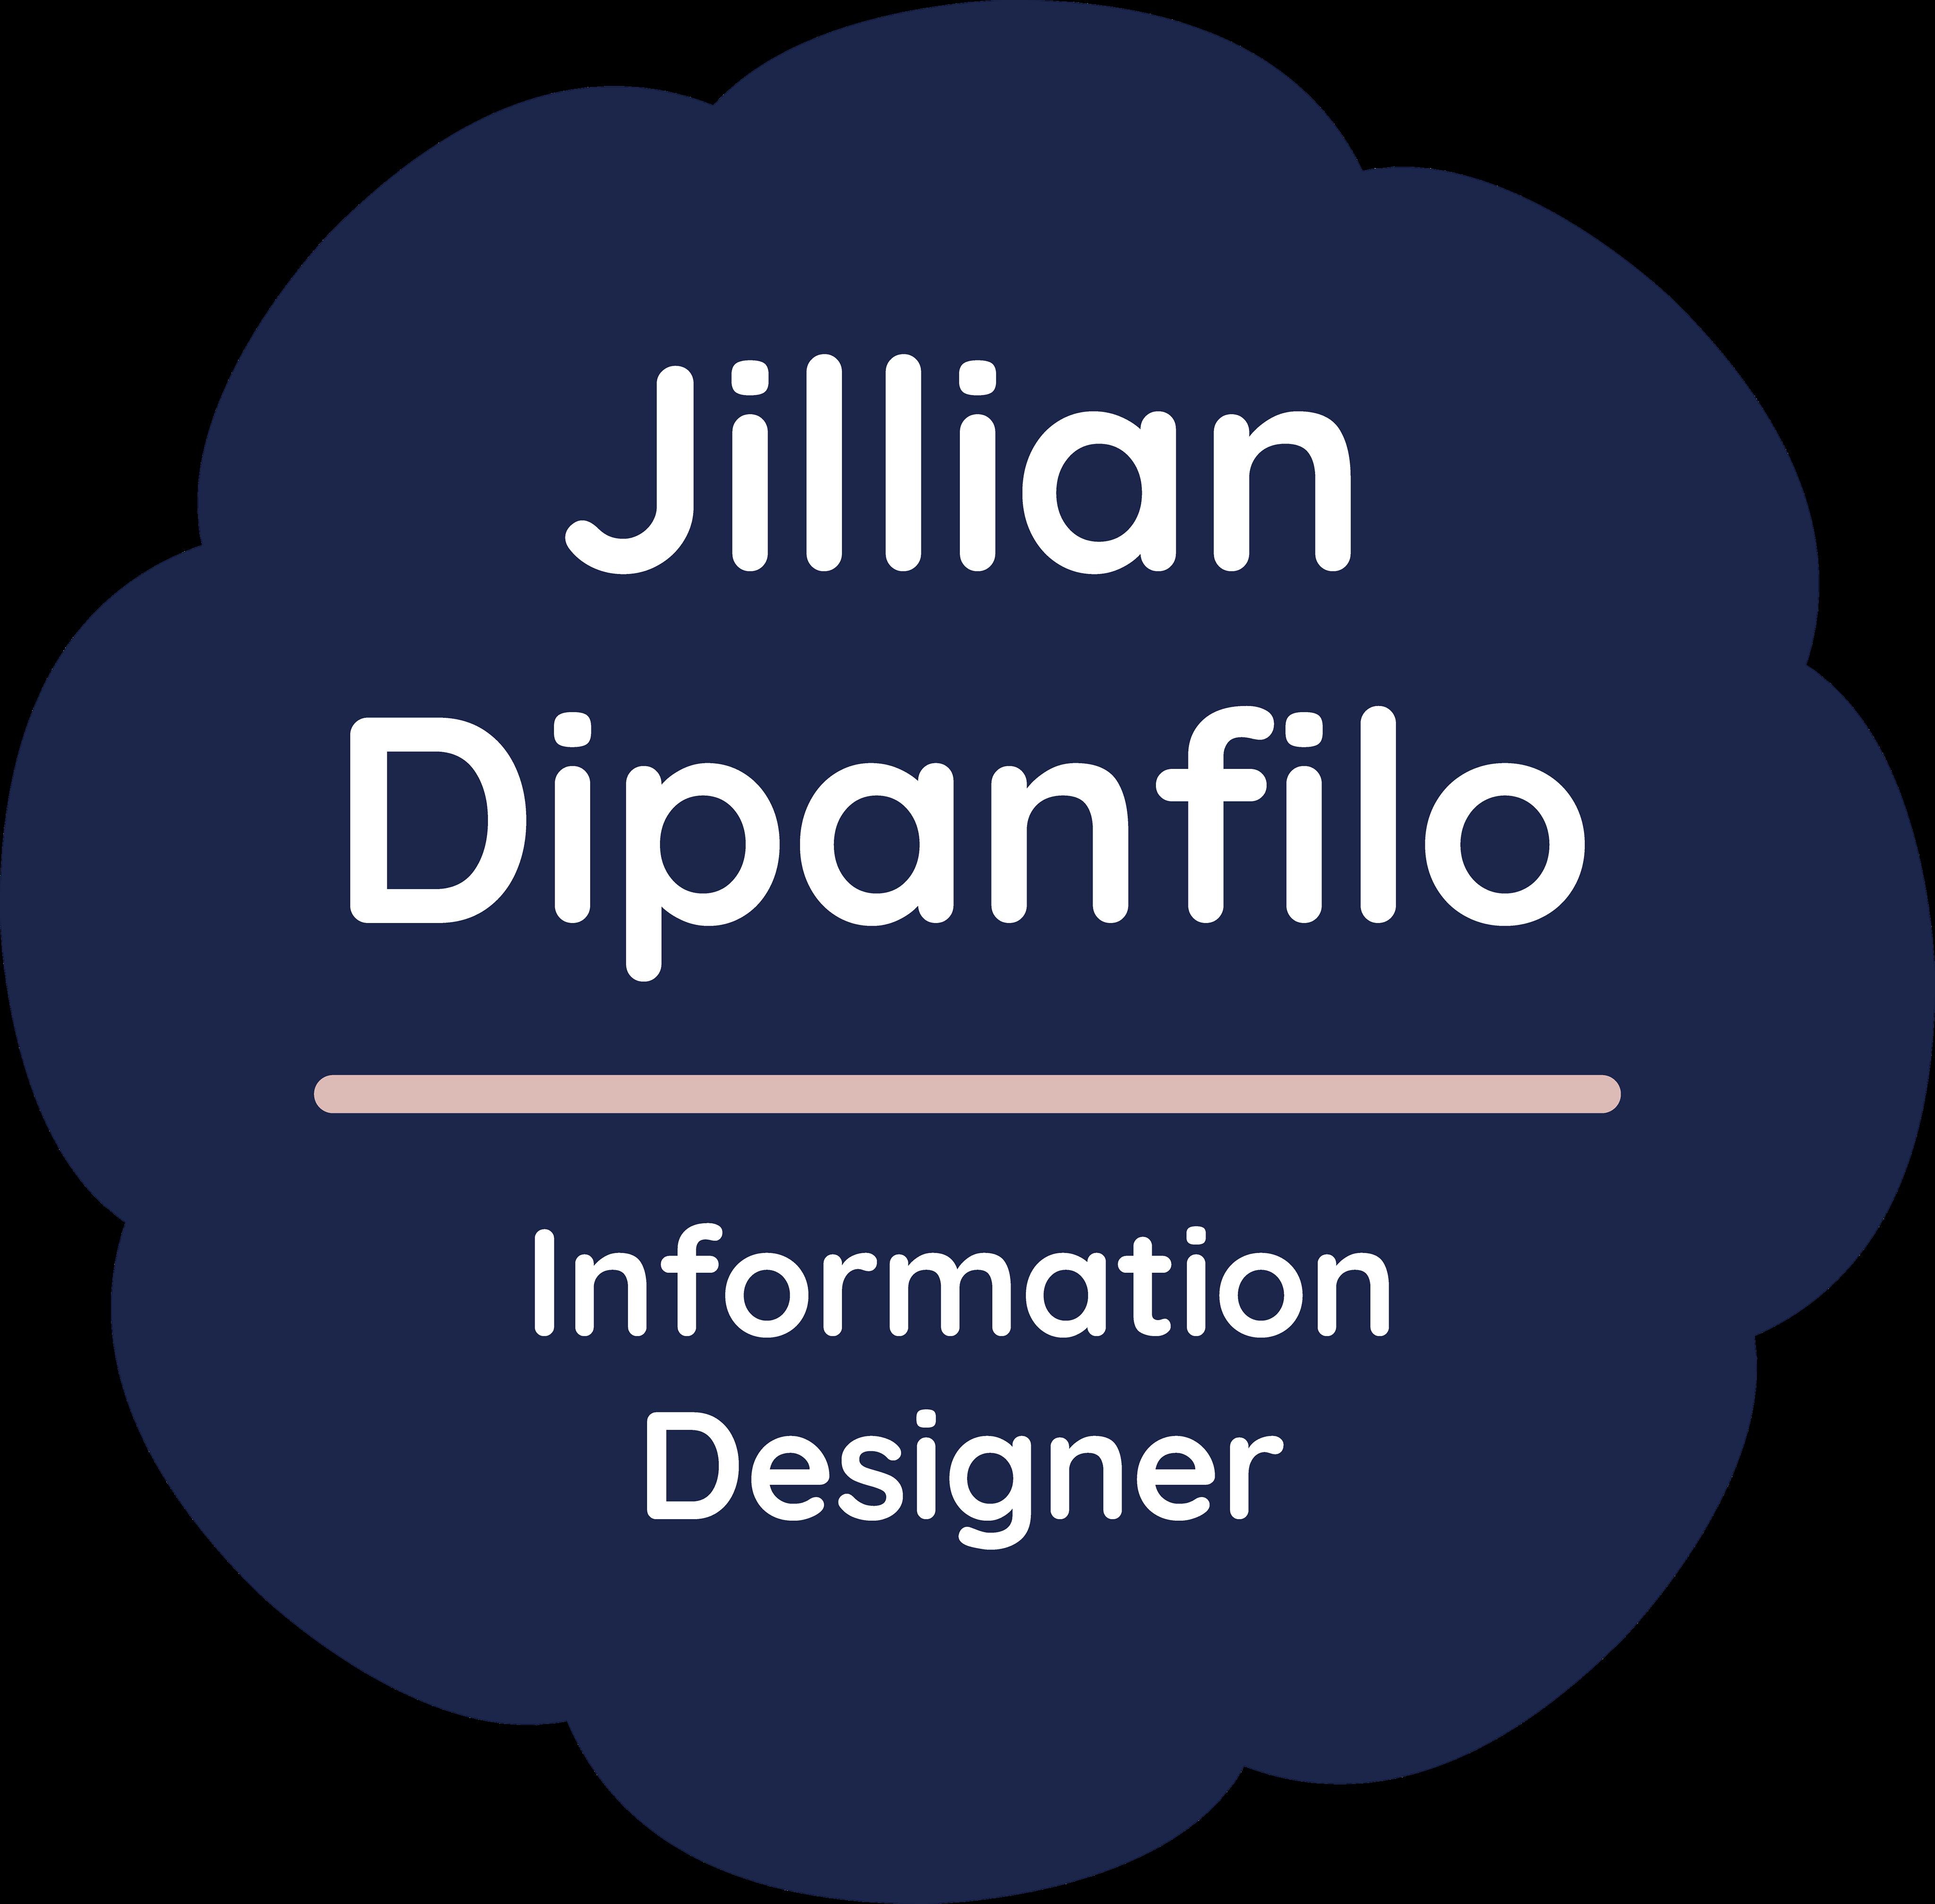 Jillian Dipanfilo